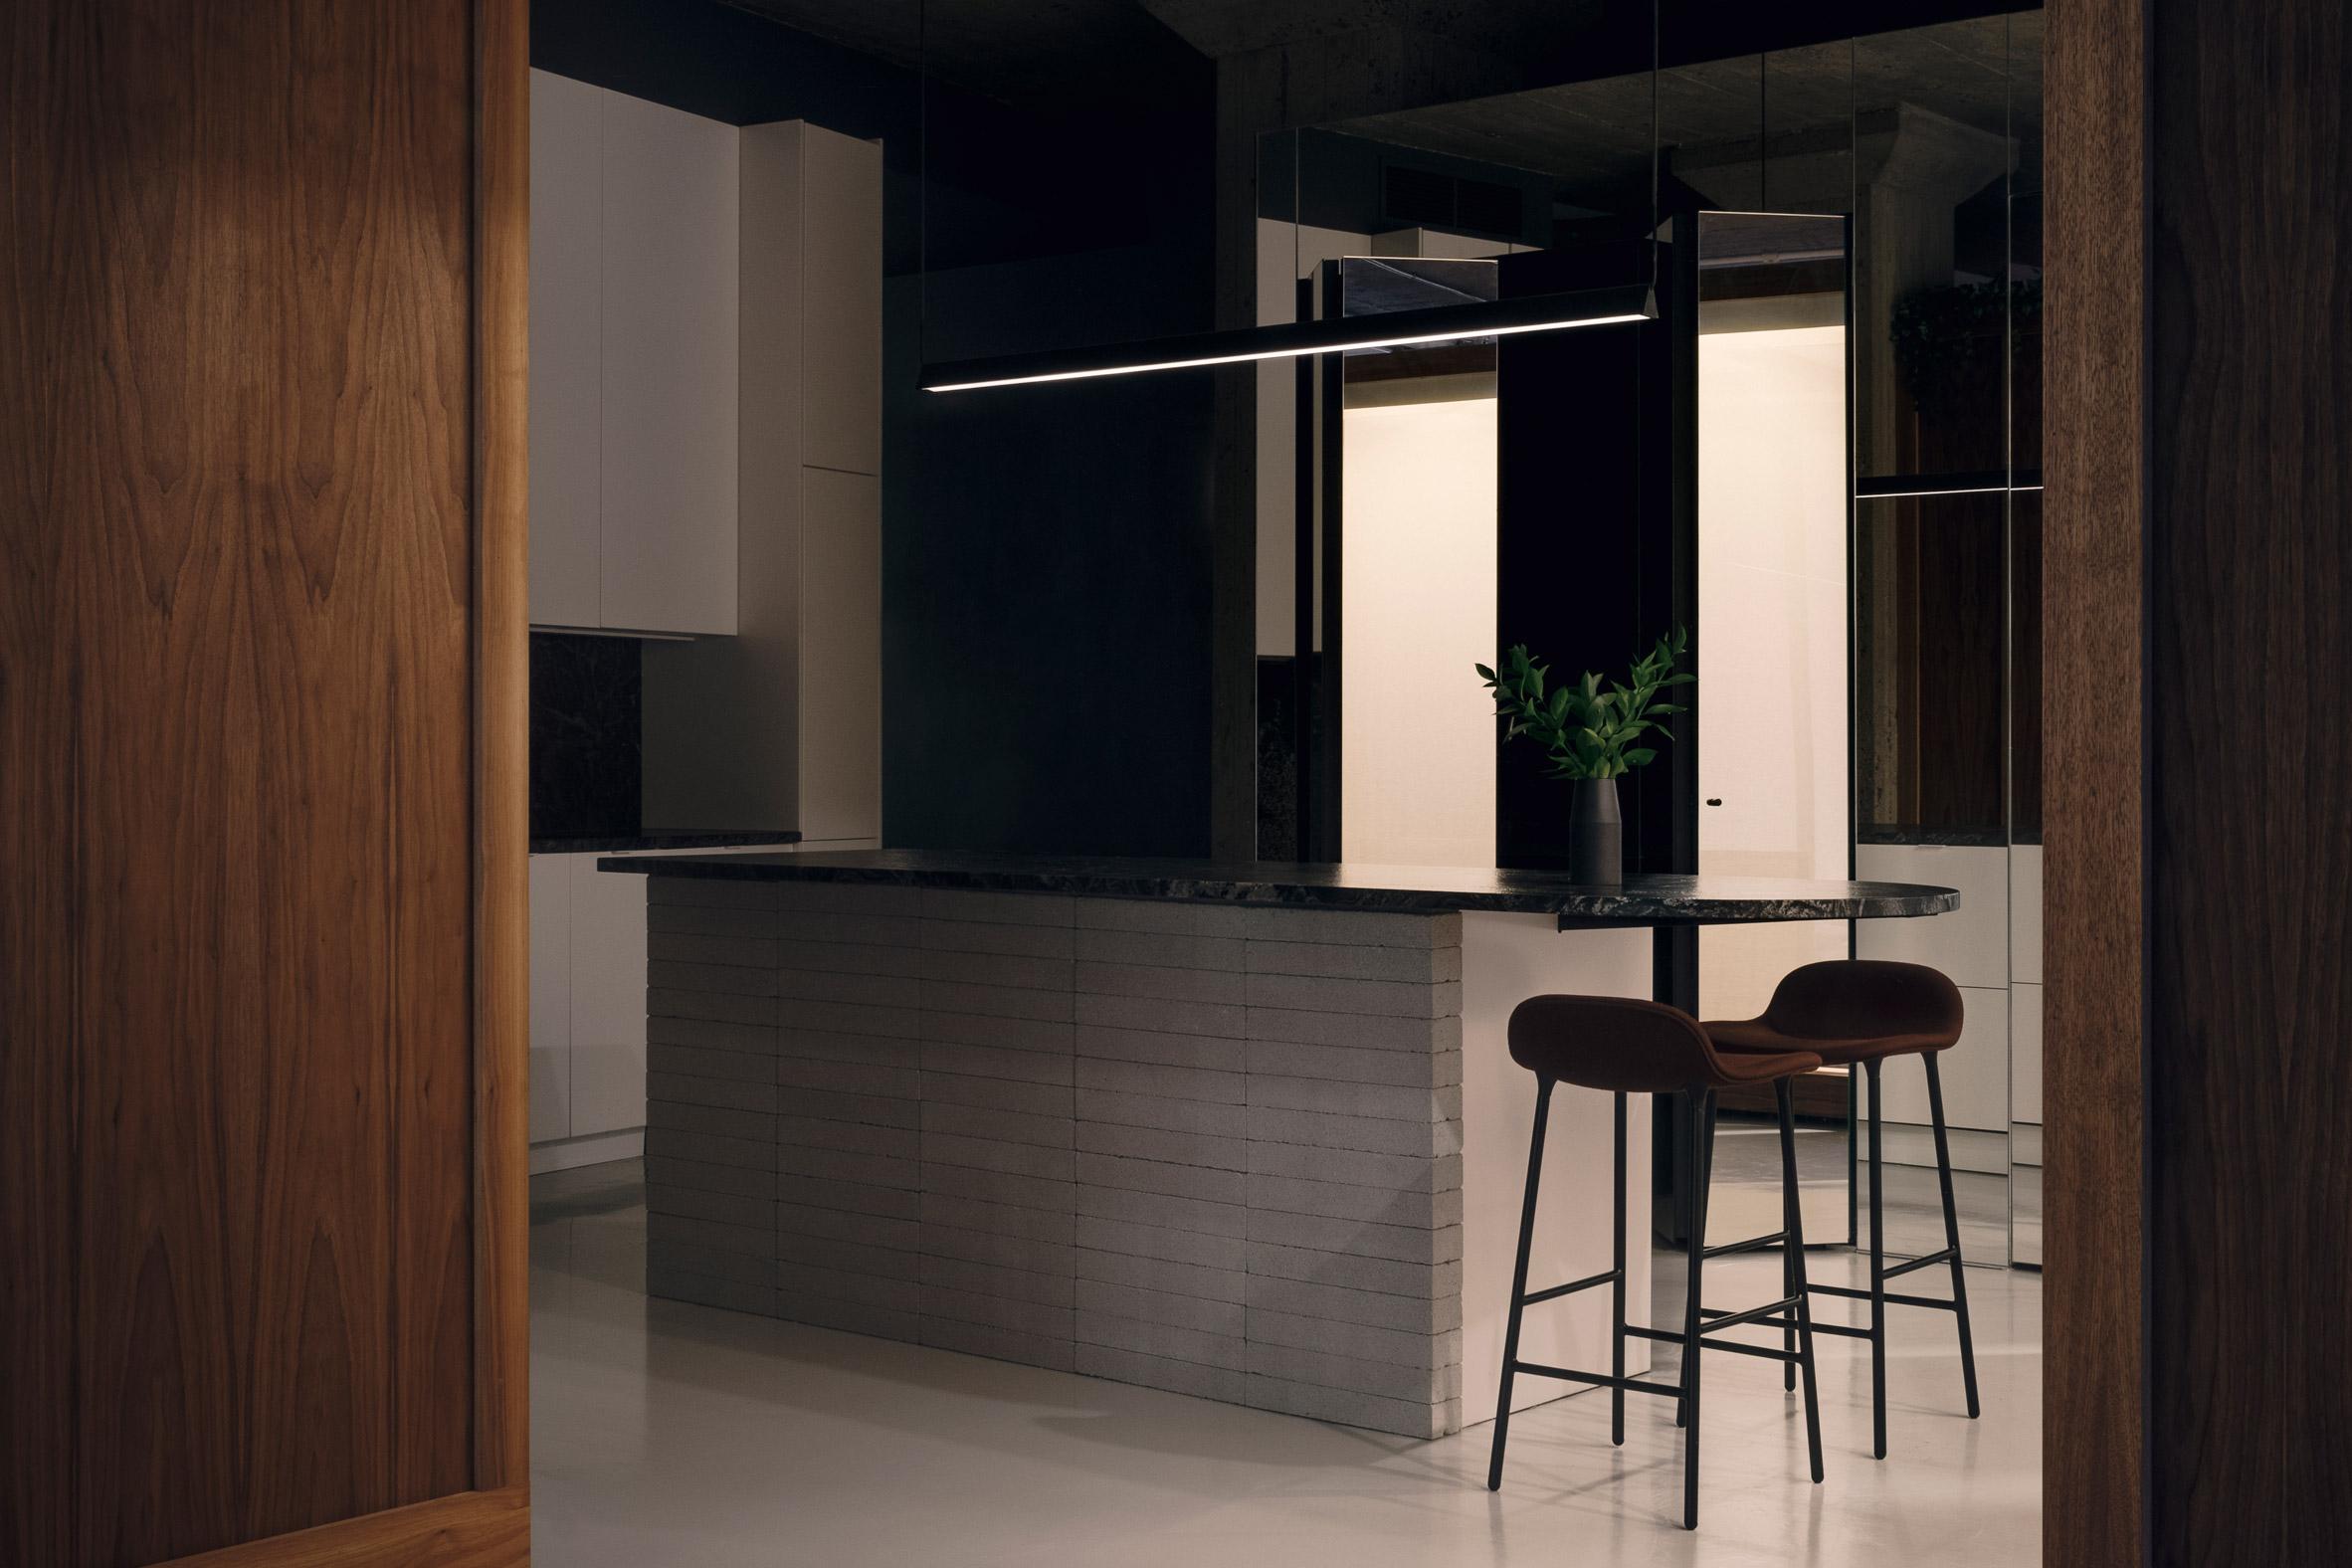 Future Simple Studio chose dark colours for the interiors